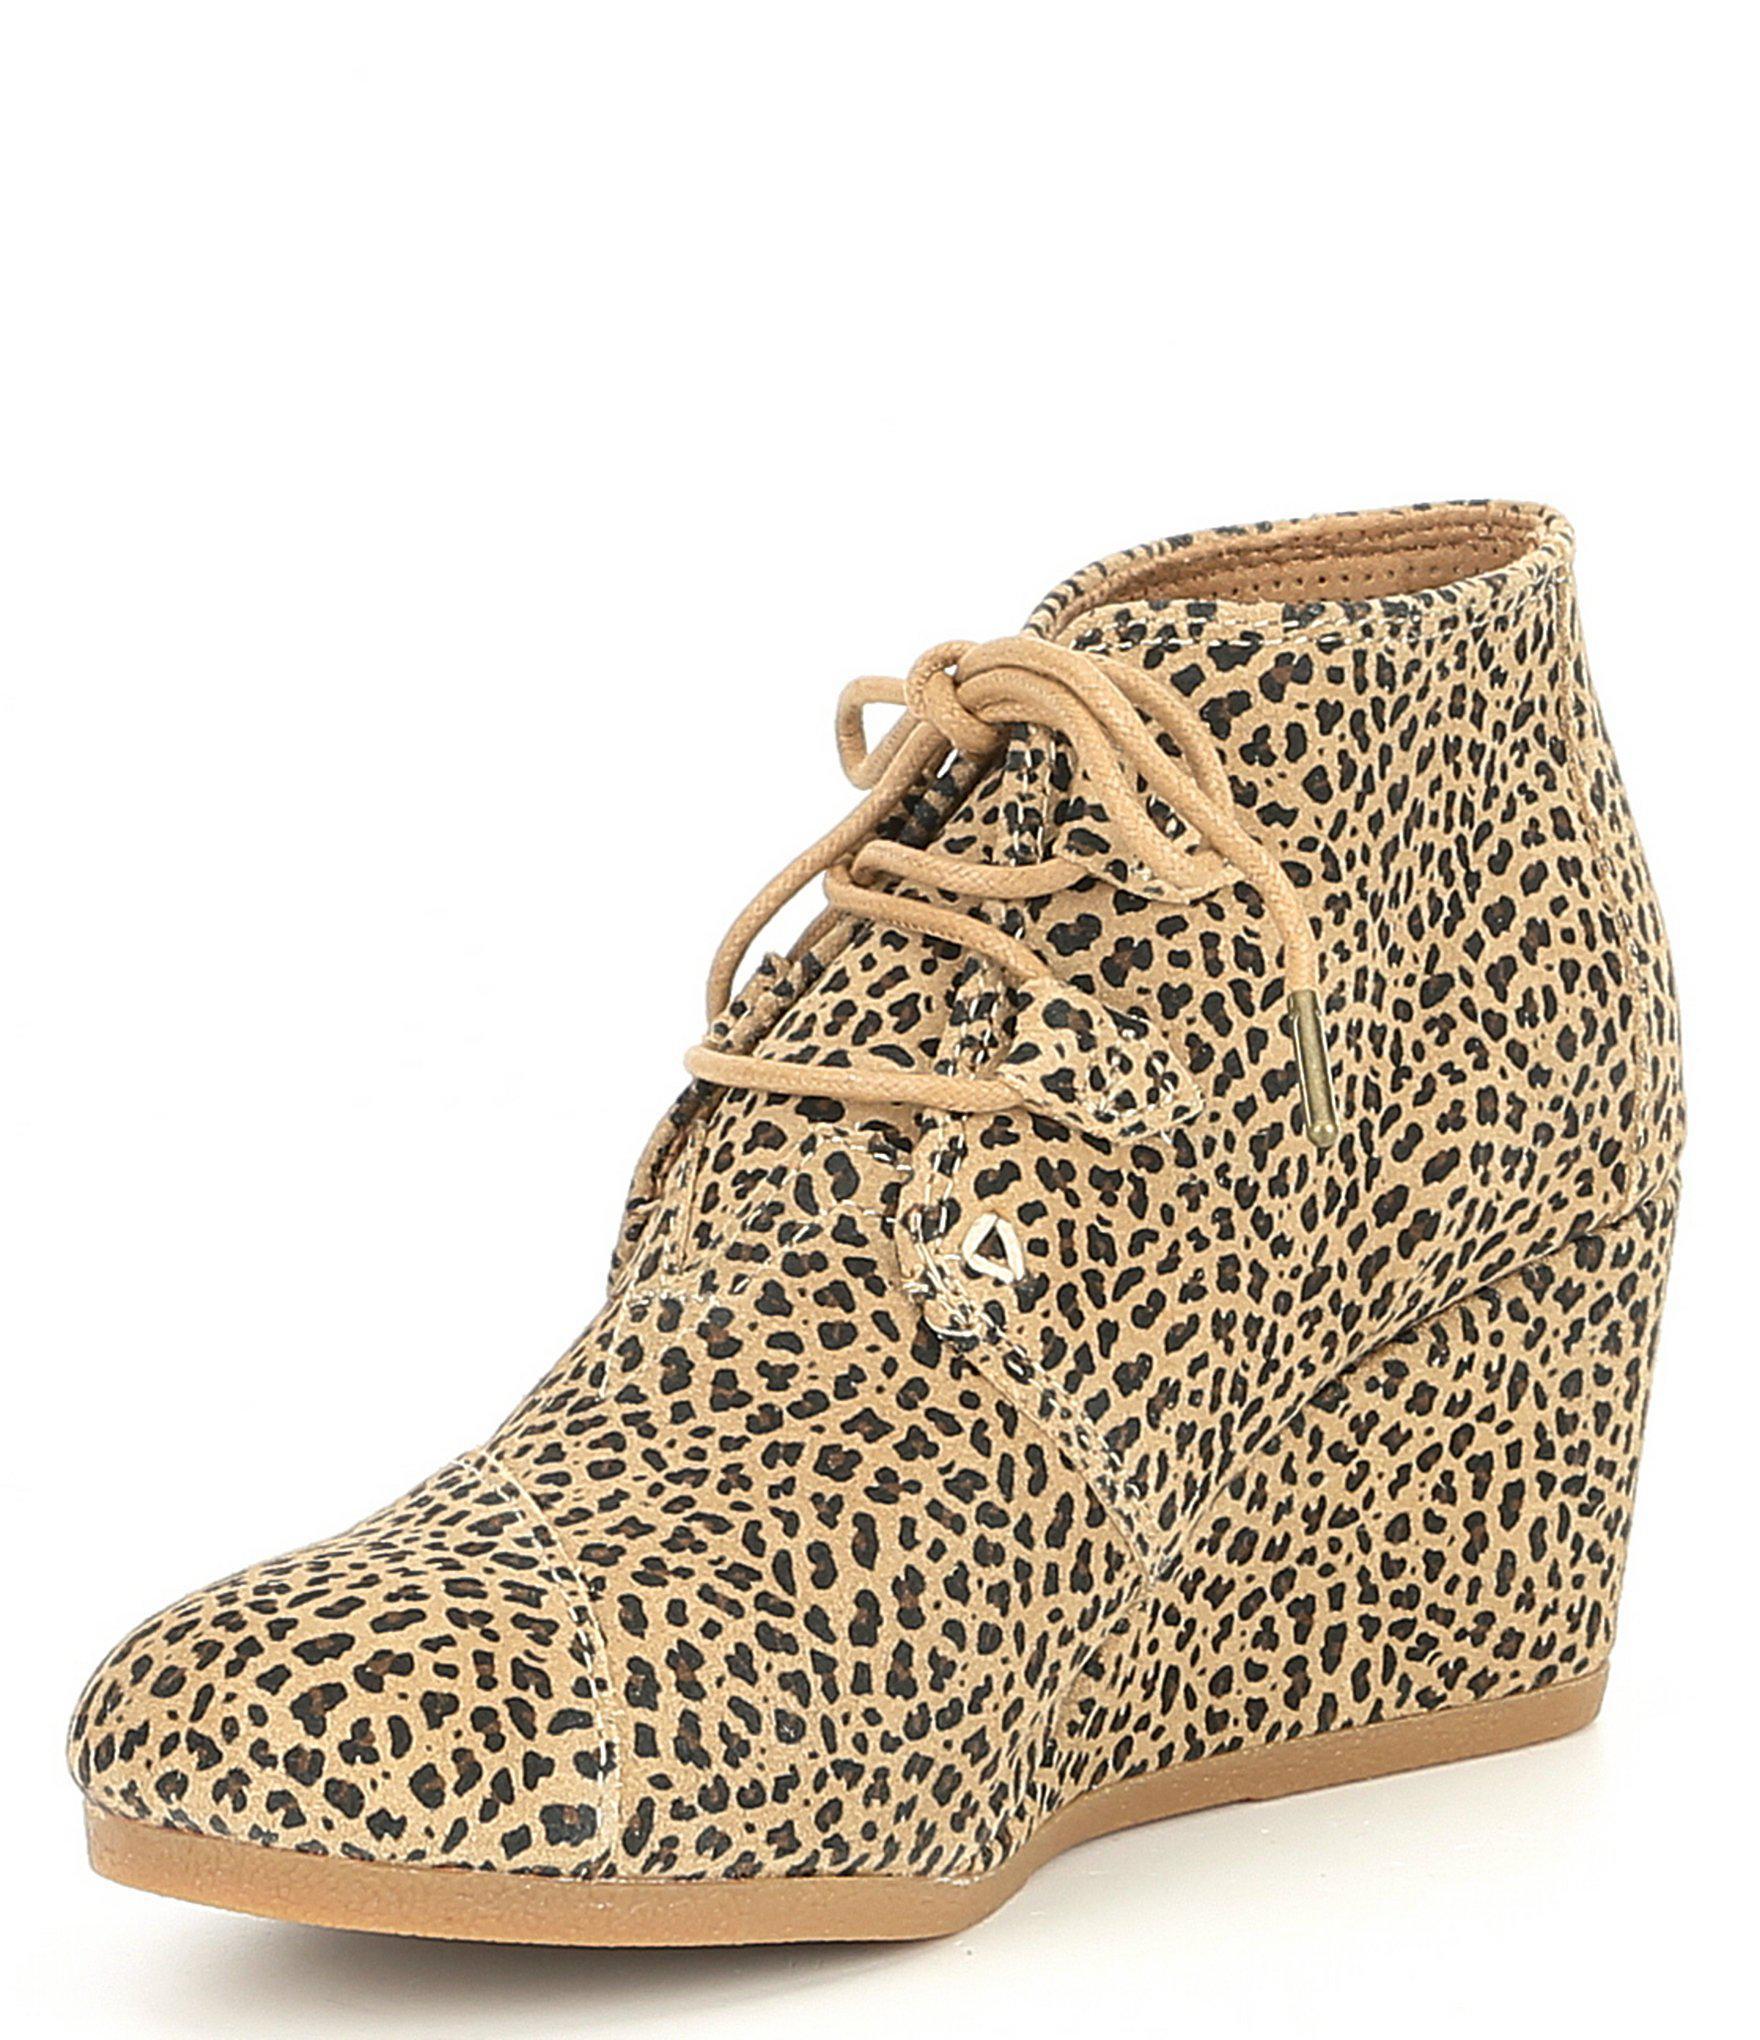 134443daa8e7 Lyst - TOMS Kala Leopard Print Wedge Booties in Brown